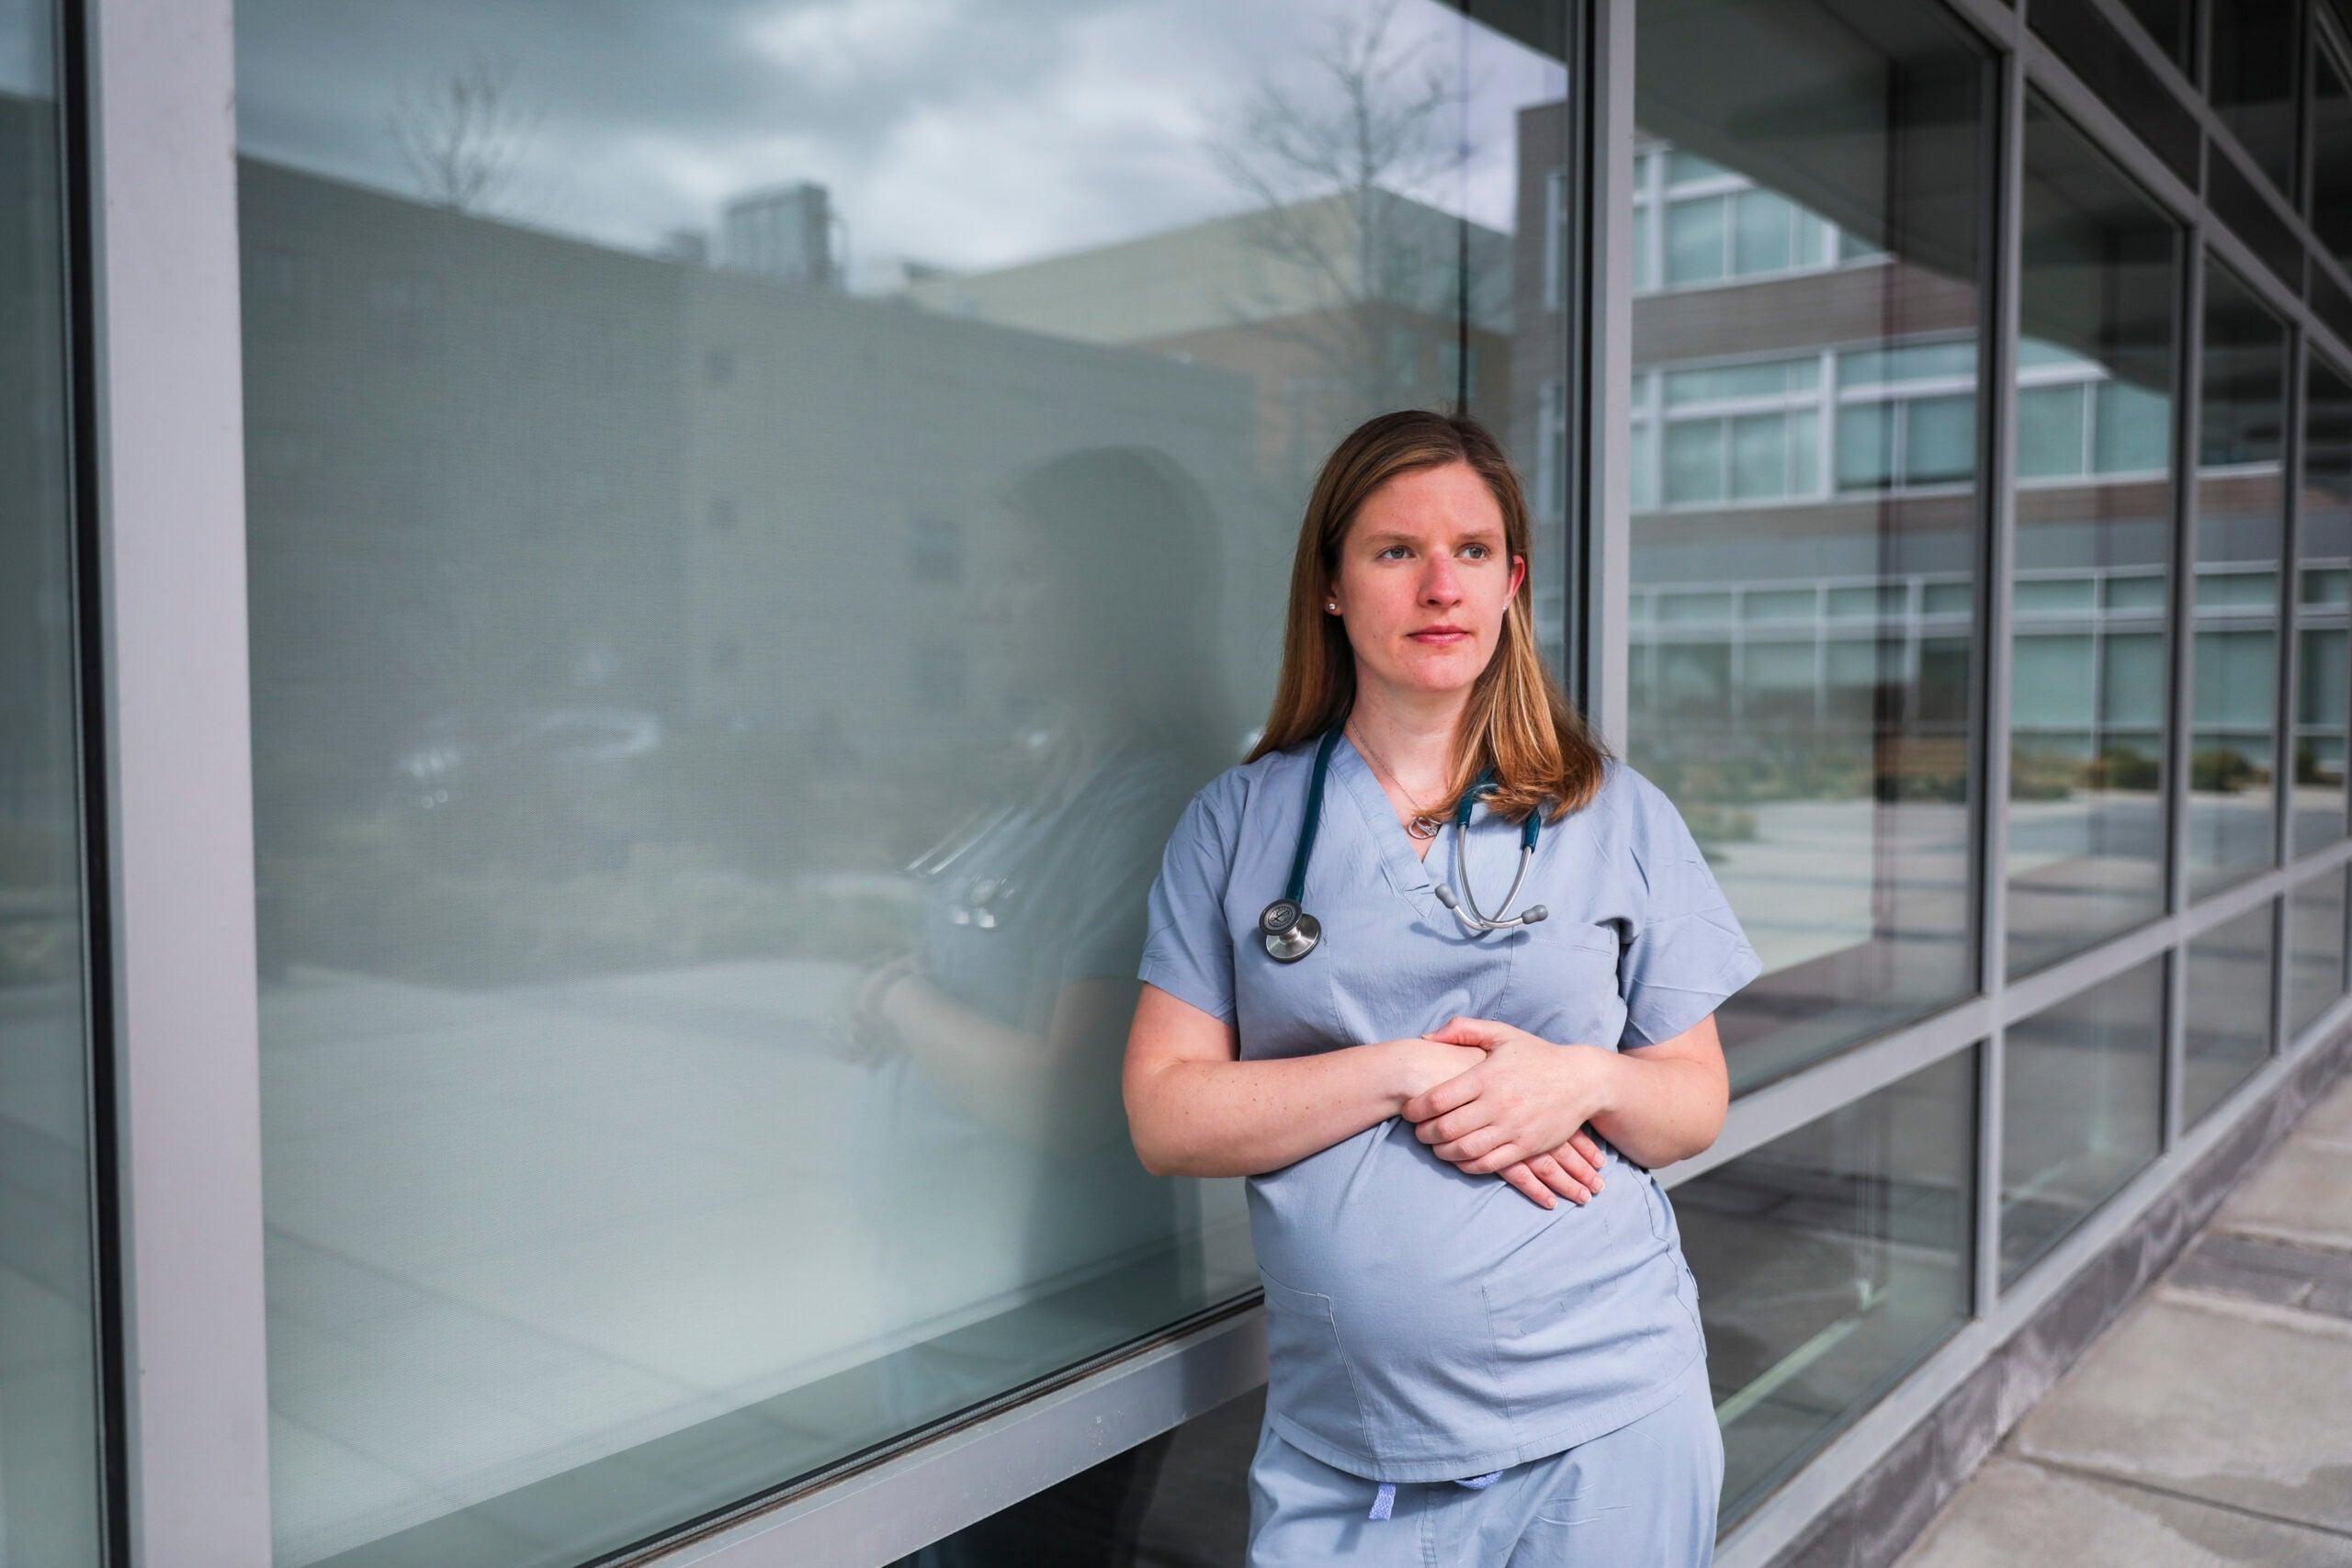 Dr. Laura Dean is Pregnant